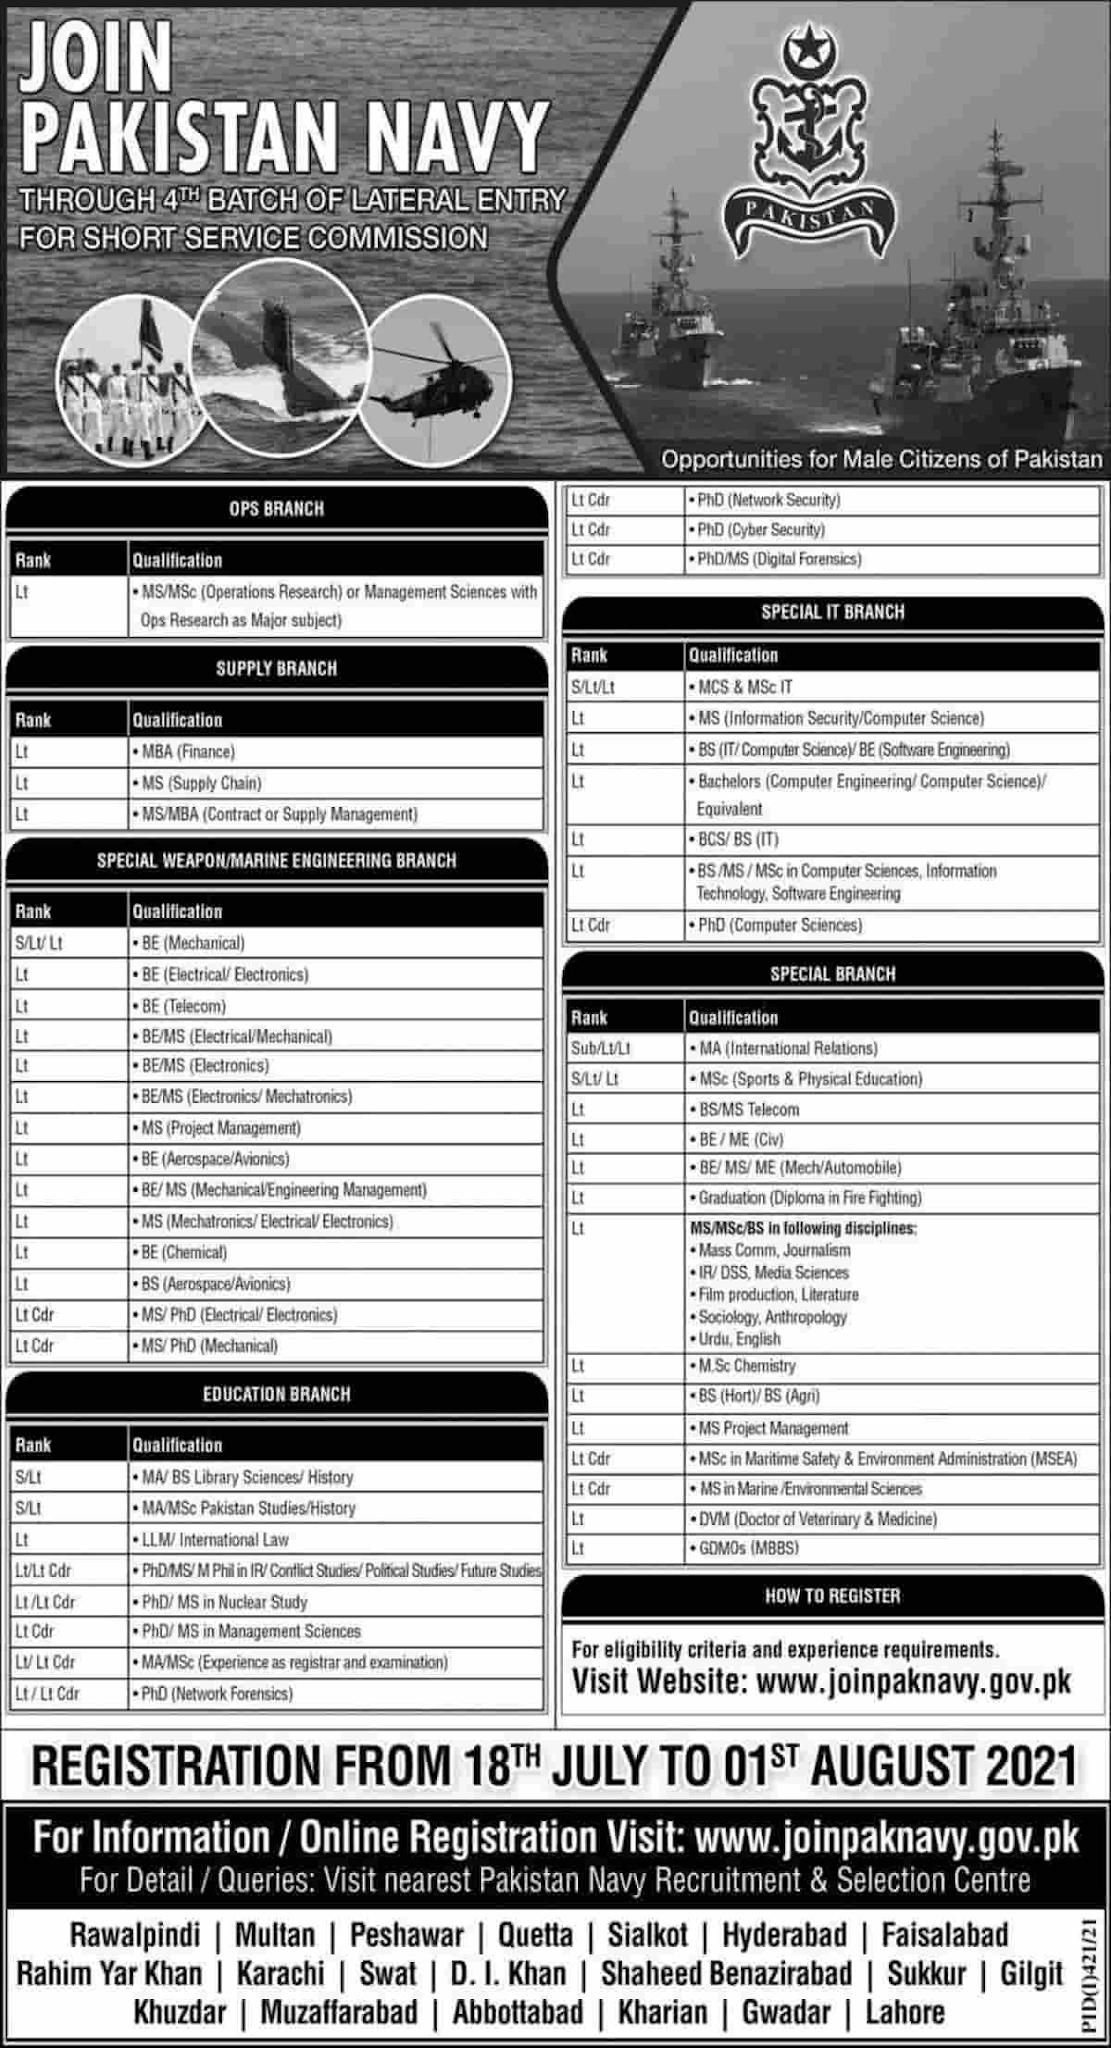 Pakistan Navy Short Service Commission SSC Jobs 2021 Advertisement